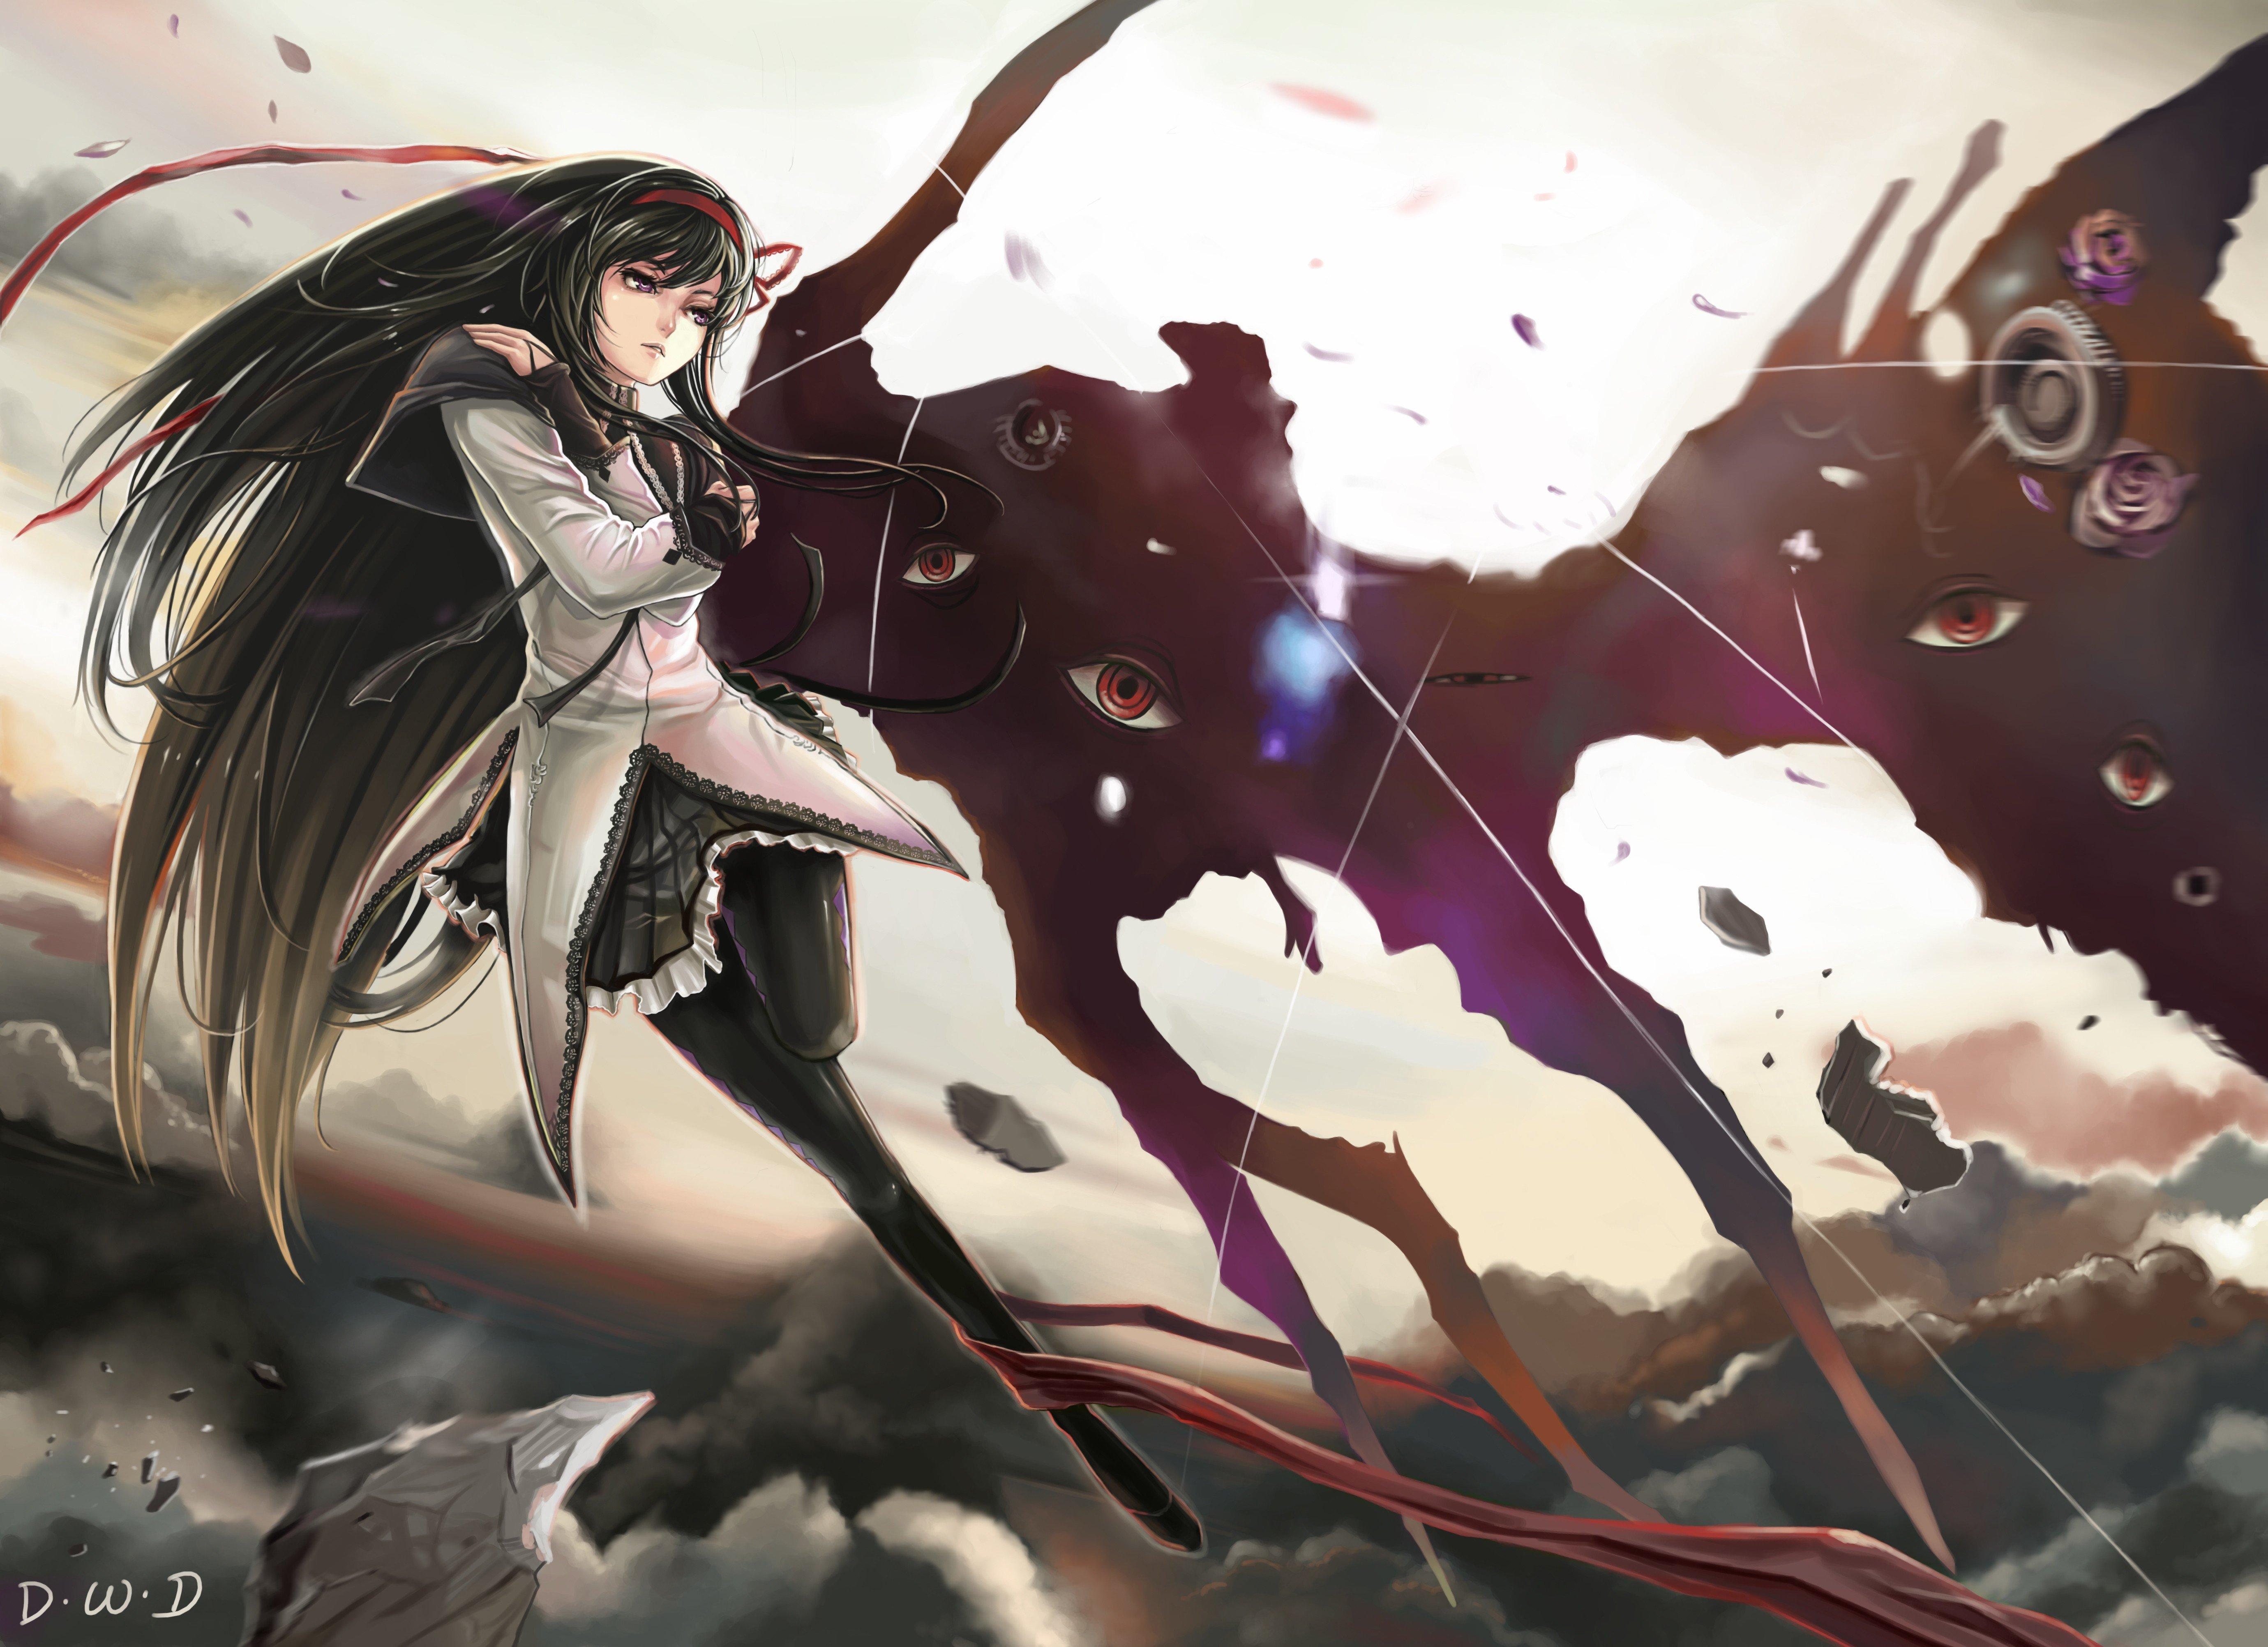 anime, Mahou Shoujo Madoka Magica, Anime girls, Akemi Homura Wallpaper